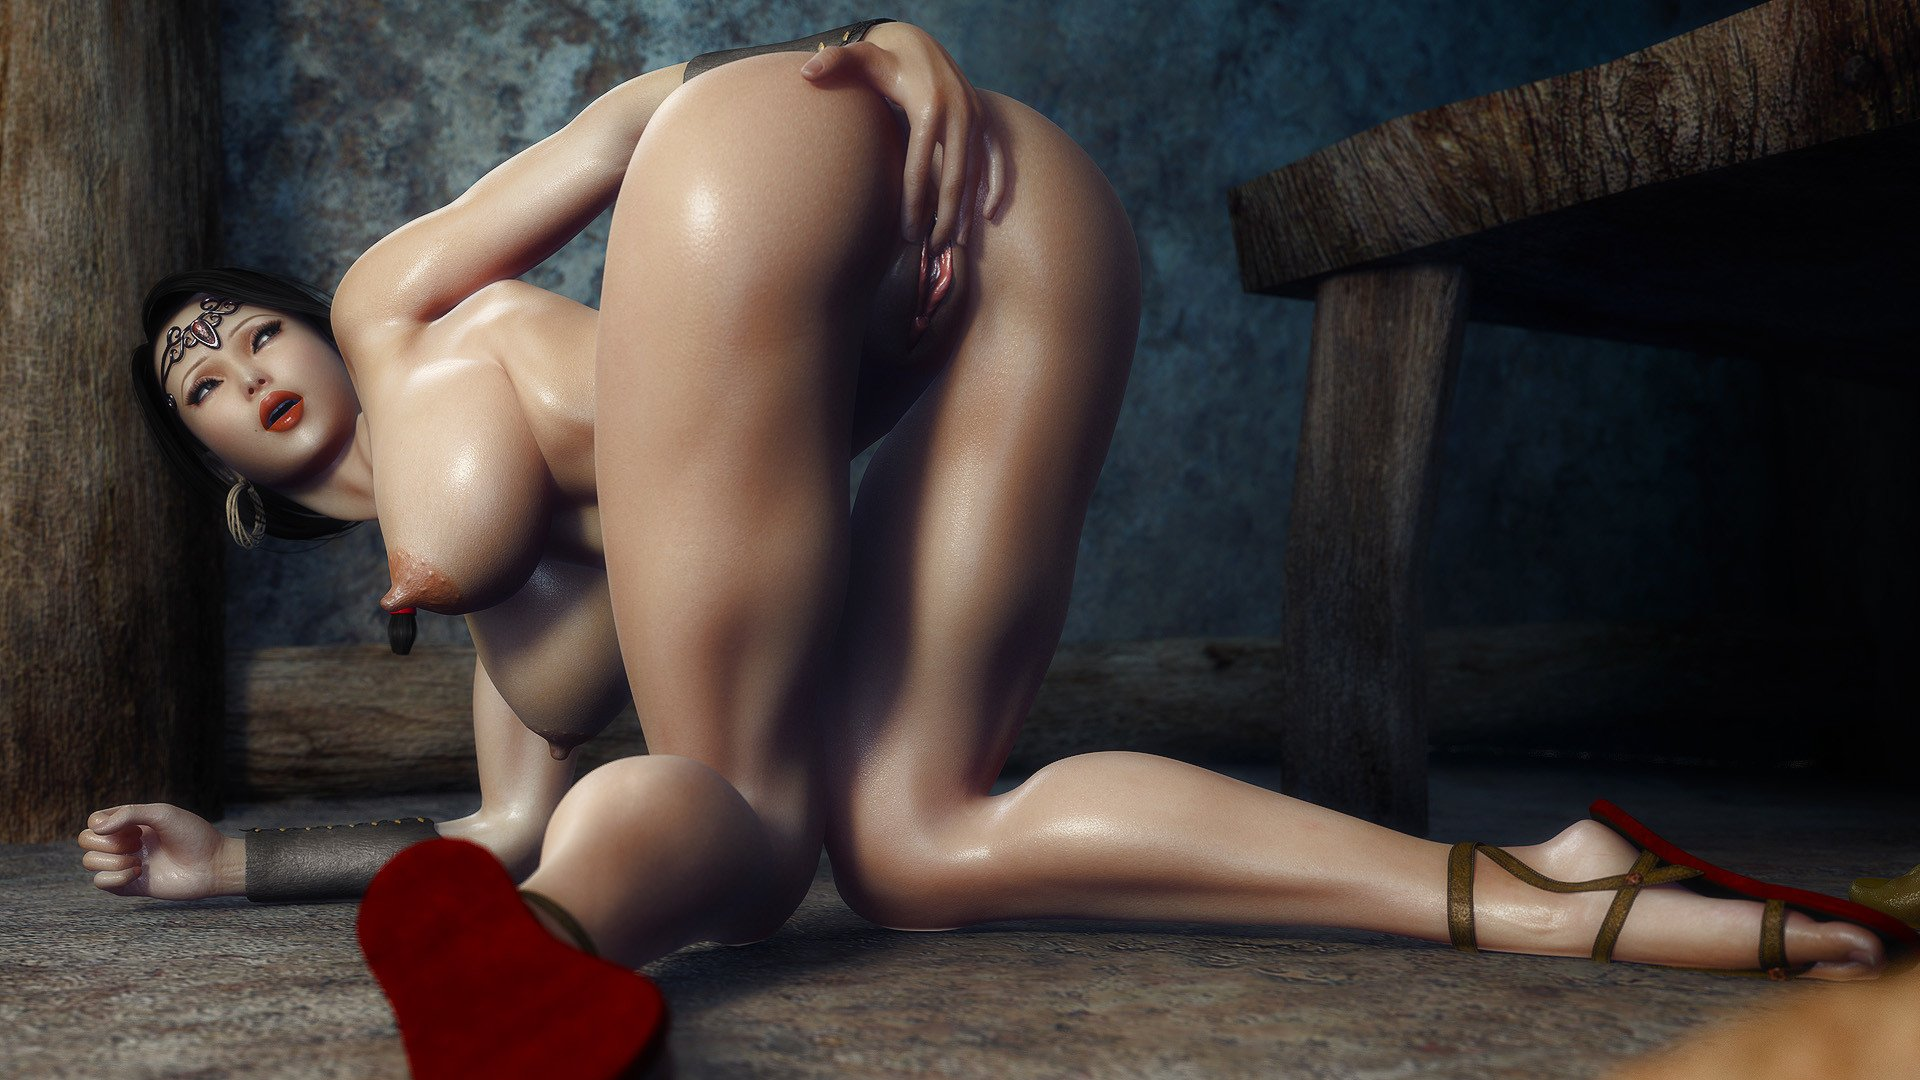 Watch Arab Cum Slut Secret Interracial Girl Public Sex Xxx Premium Porn Pics